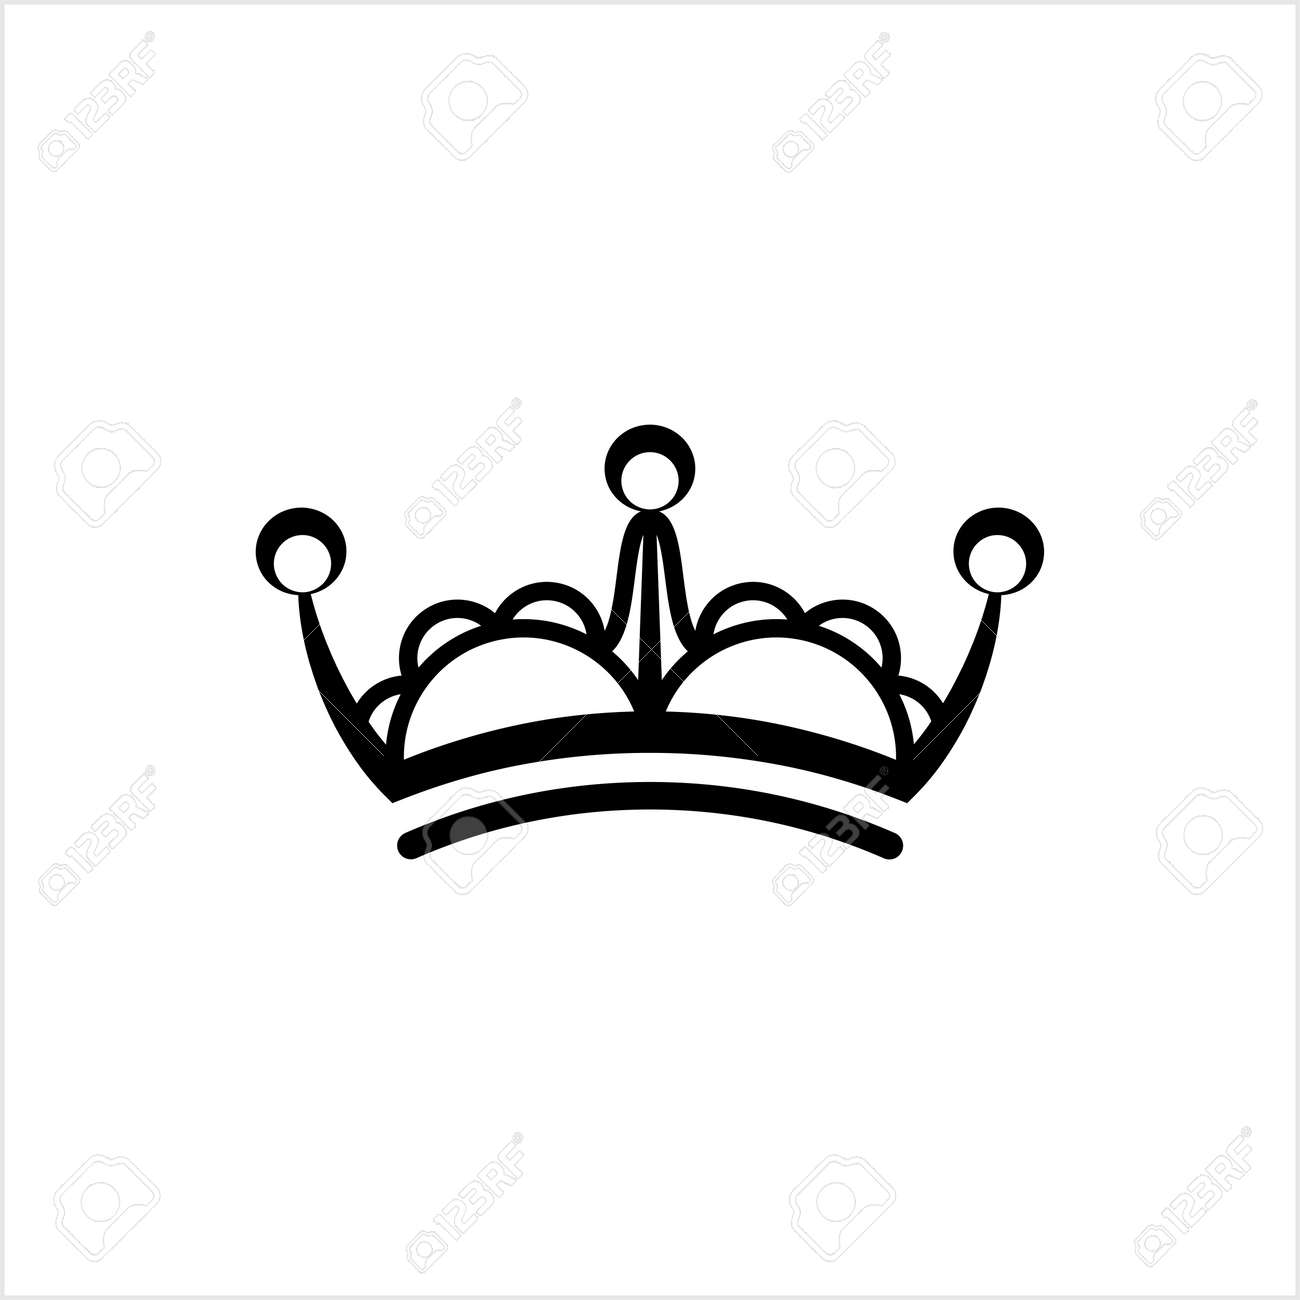 Crown Icon, Crown Vector Art Illustration - 148095194